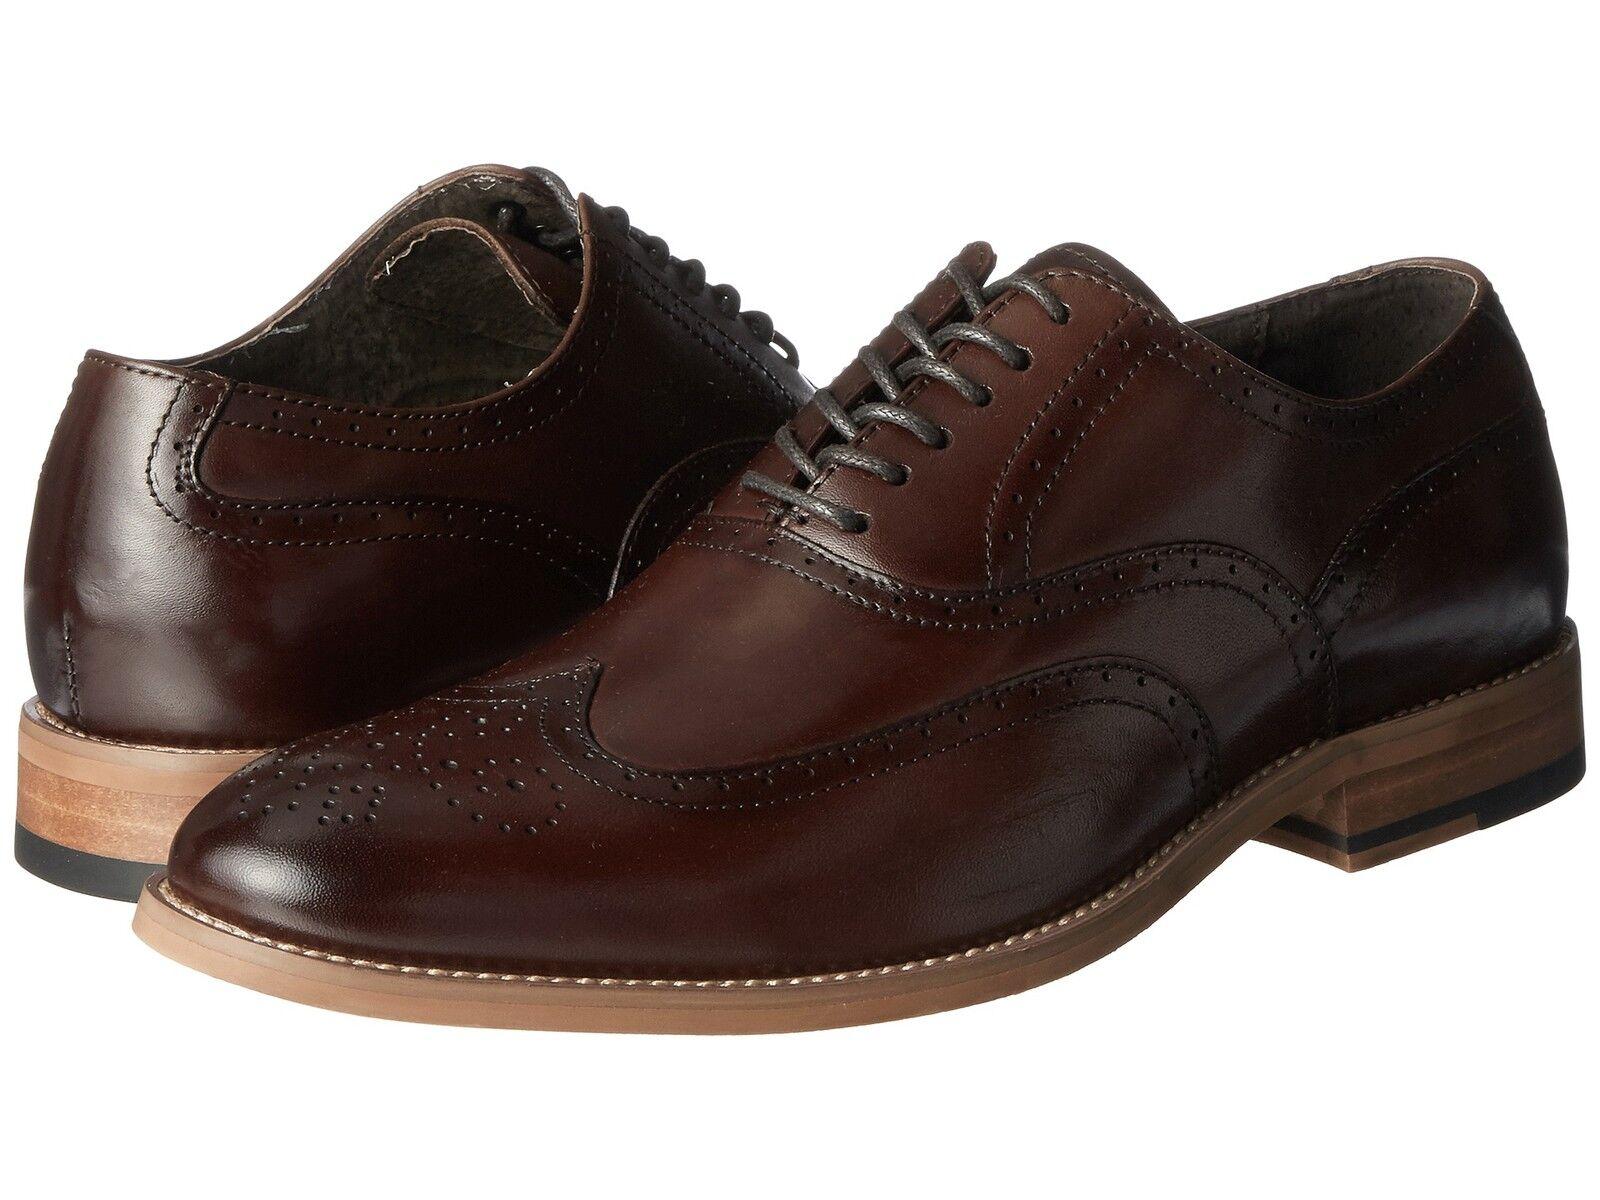 negozio online outlet Stacy Adams Uomo DUNBAR DUNBAR DUNBAR Wingtip oxford Leather Cognac scarpe 25064-221  prezzo all'ingrosso e qualità affidabile